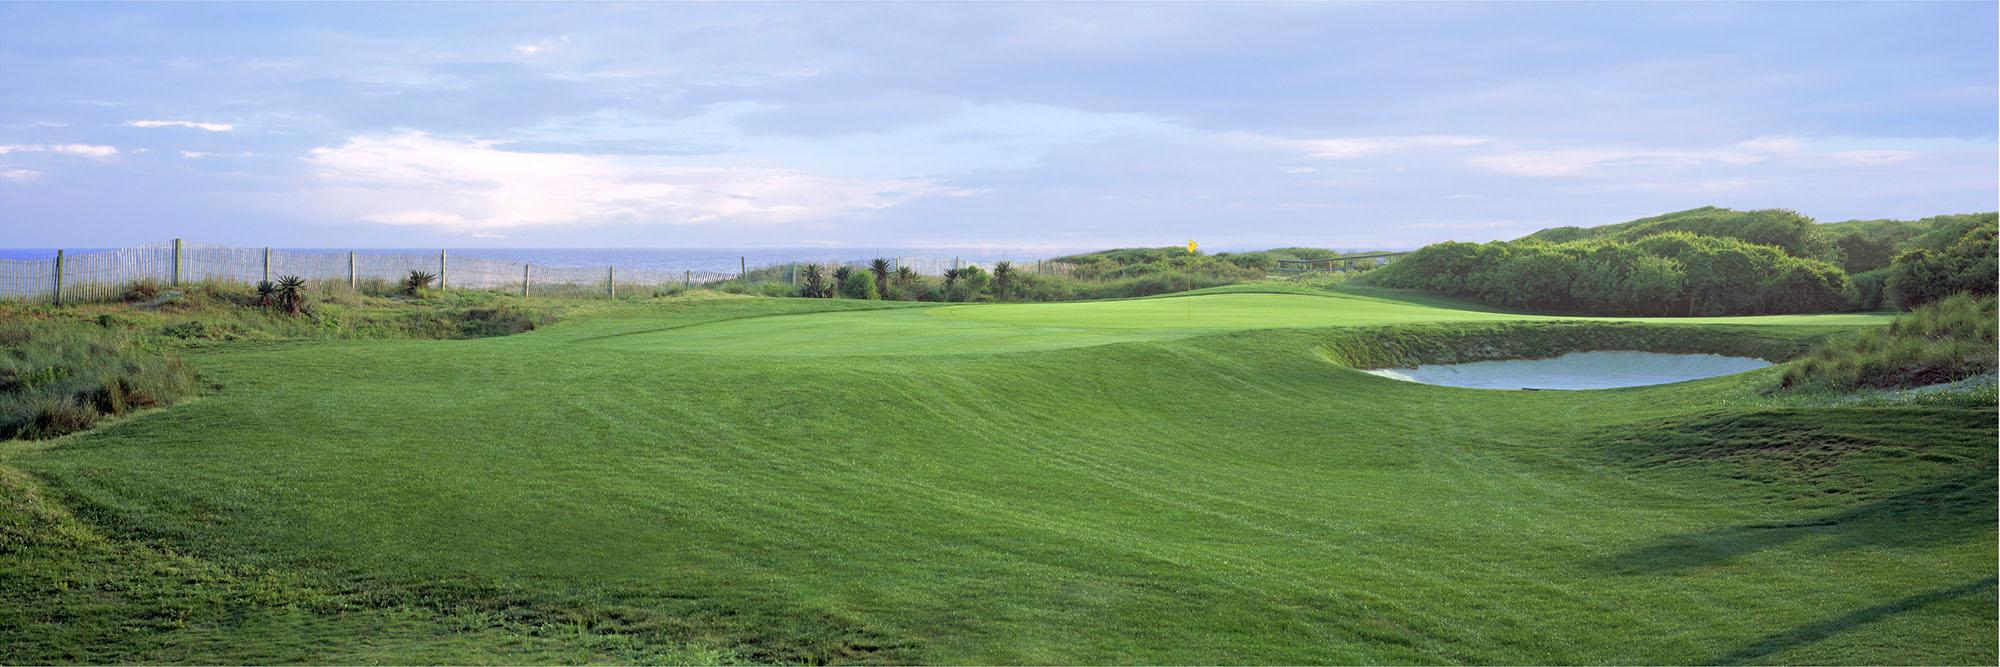 Golf Course Image - Kiawah Turtle Point No. 16